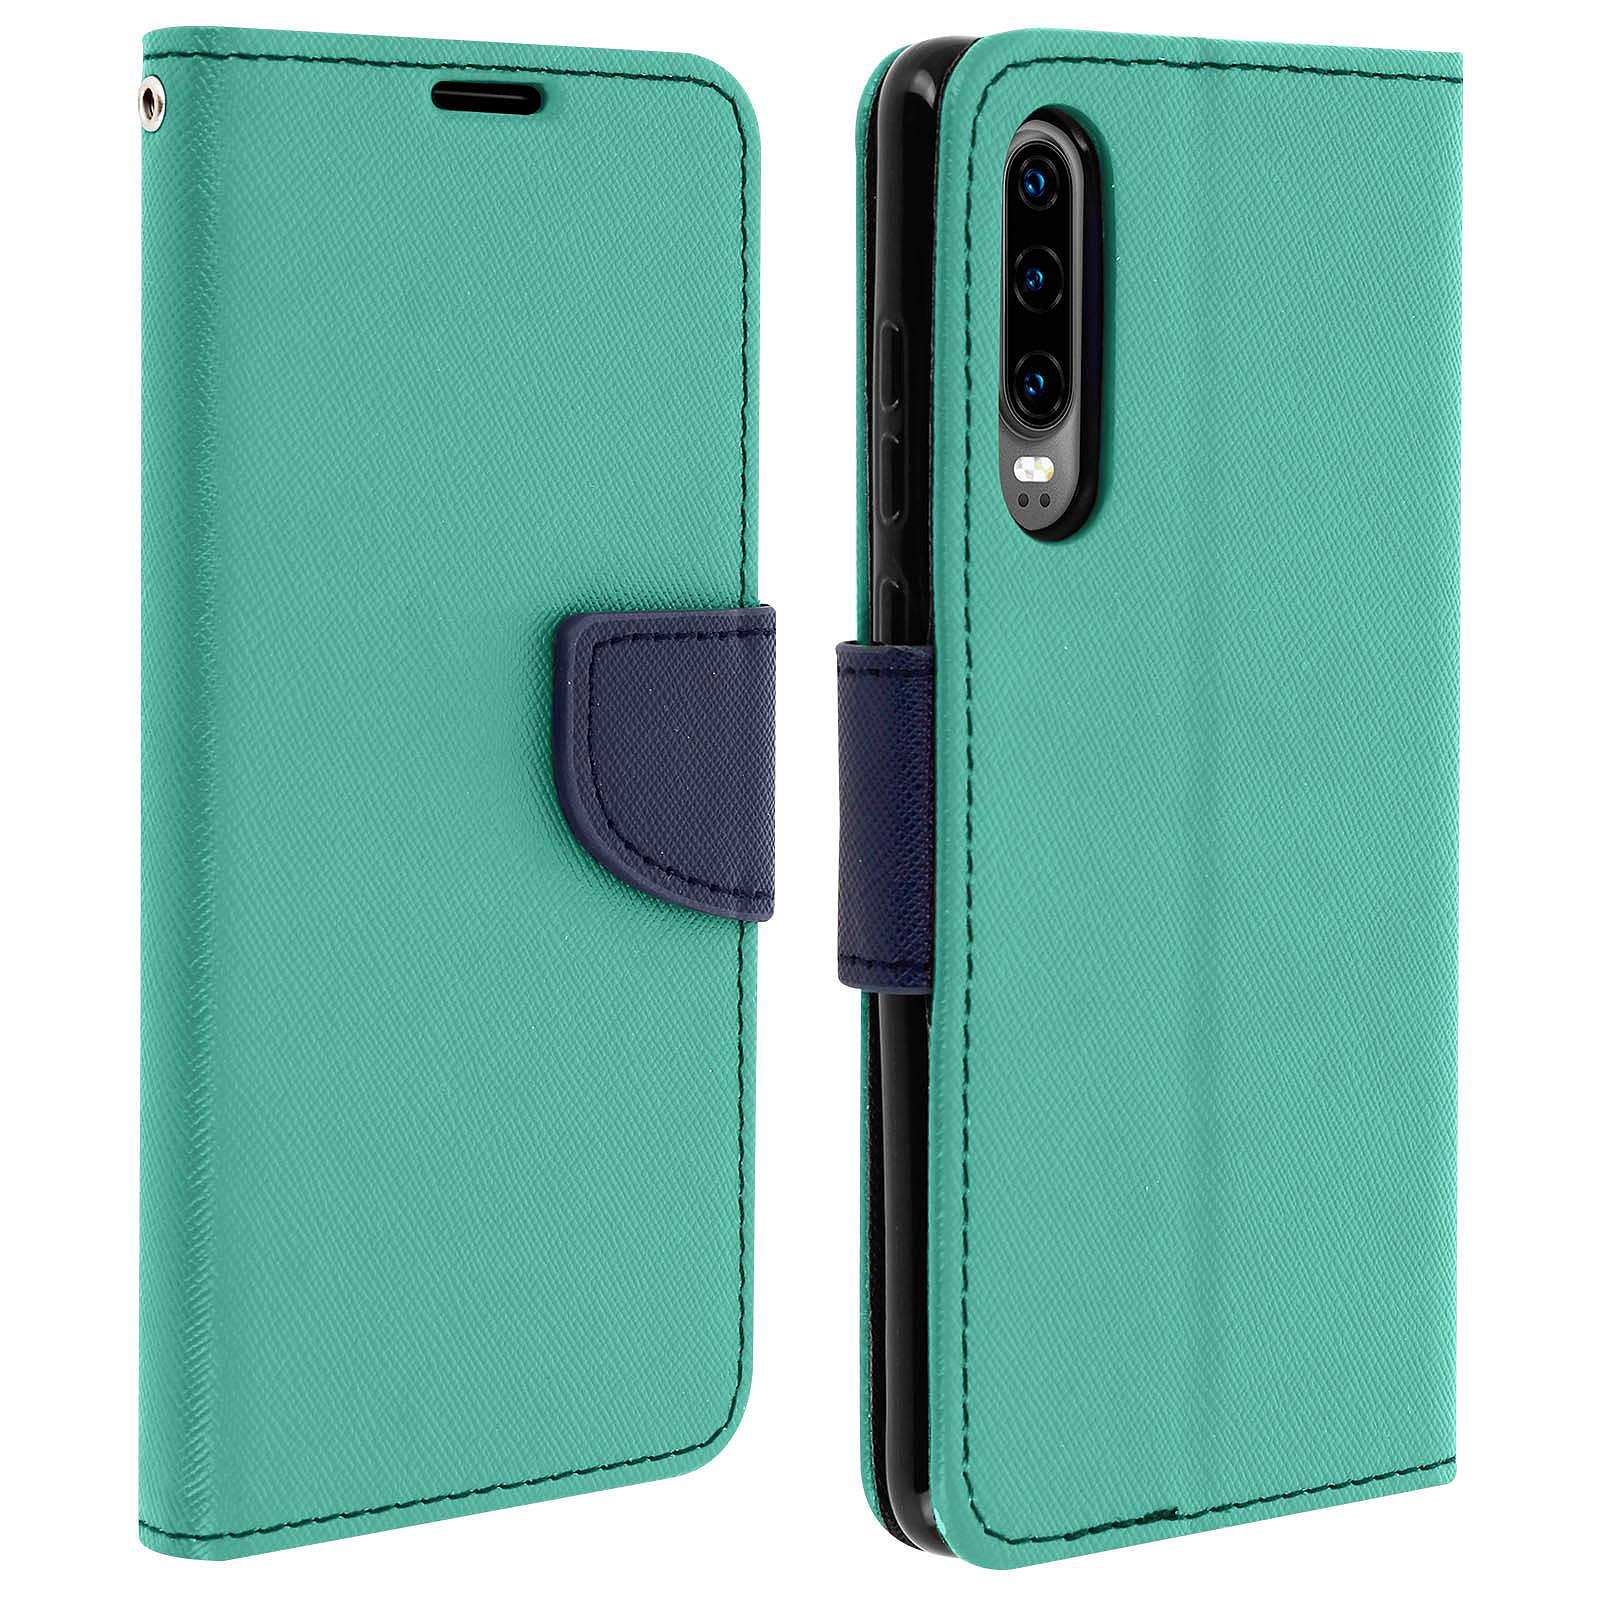 Avizar Etui folio Vert pour Huawei P30